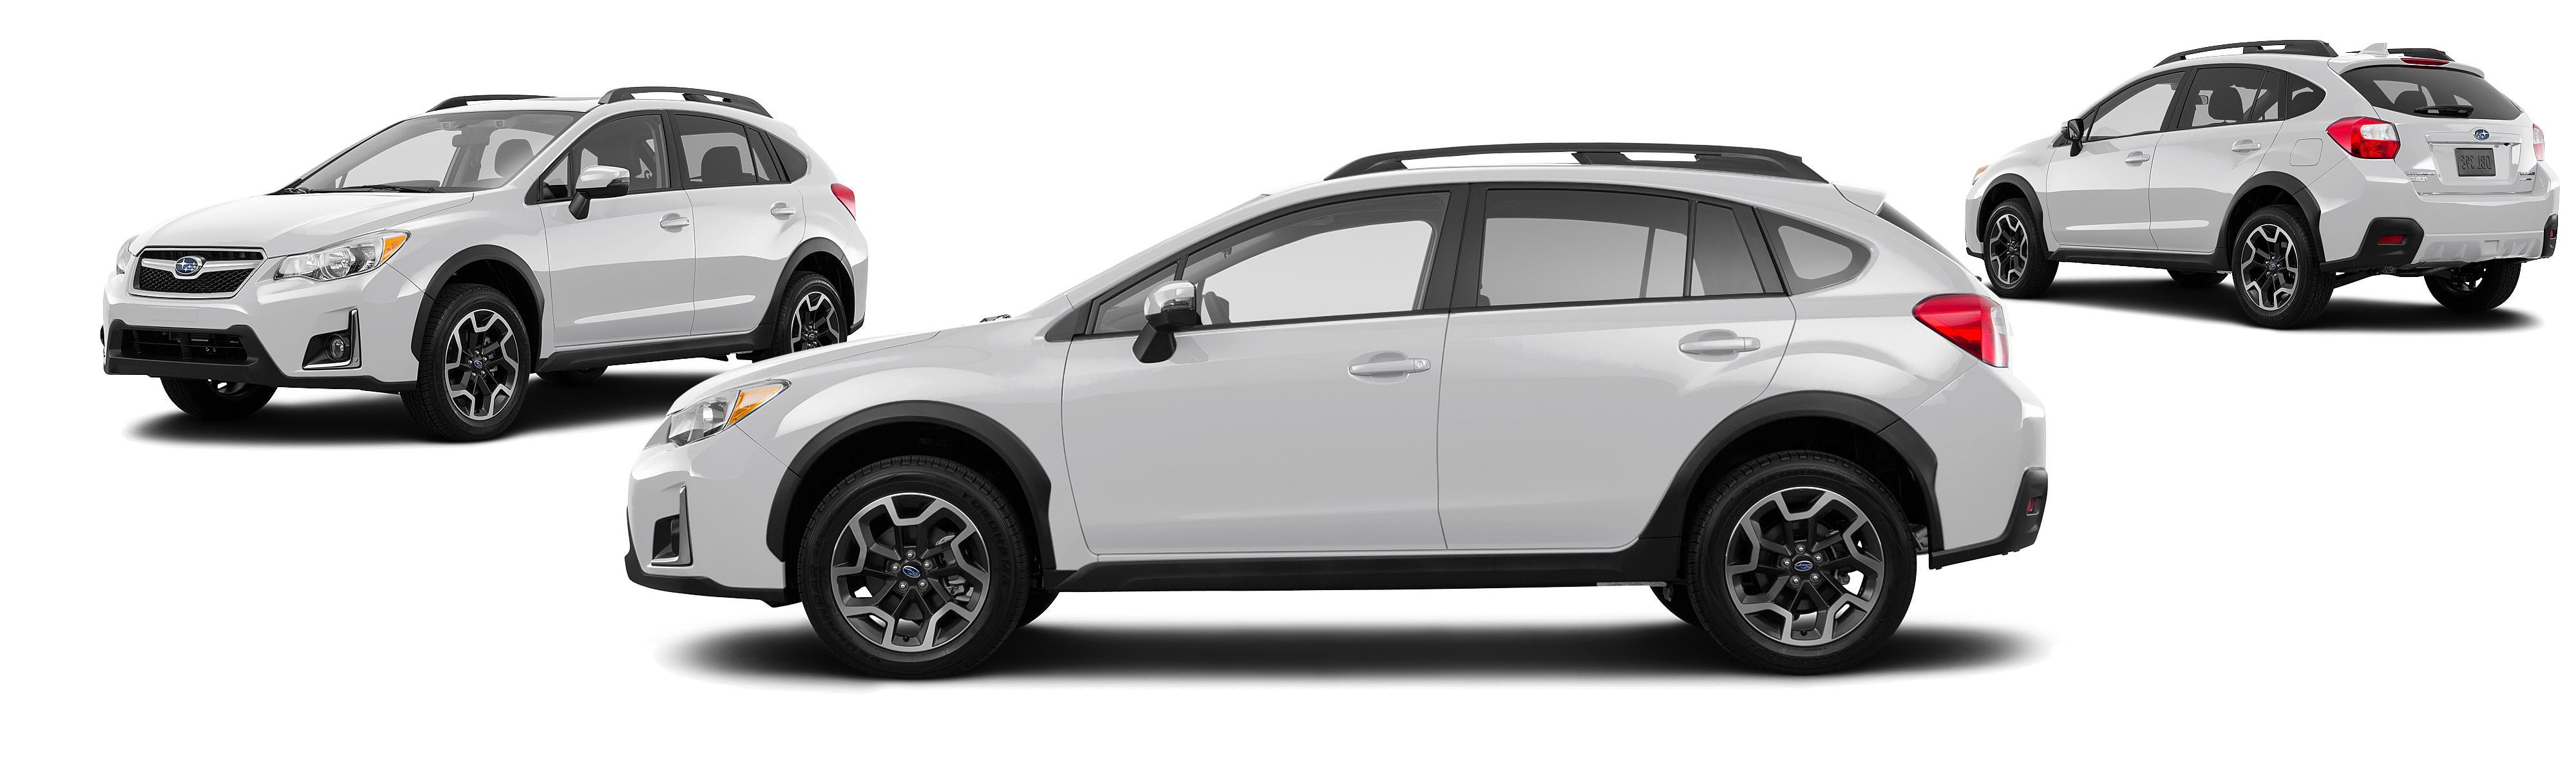 100 black subaru crosstrek subaru 2017 2 0l standard in uae new car prices specs ckd. Black Bedroom Furniture Sets. Home Design Ideas